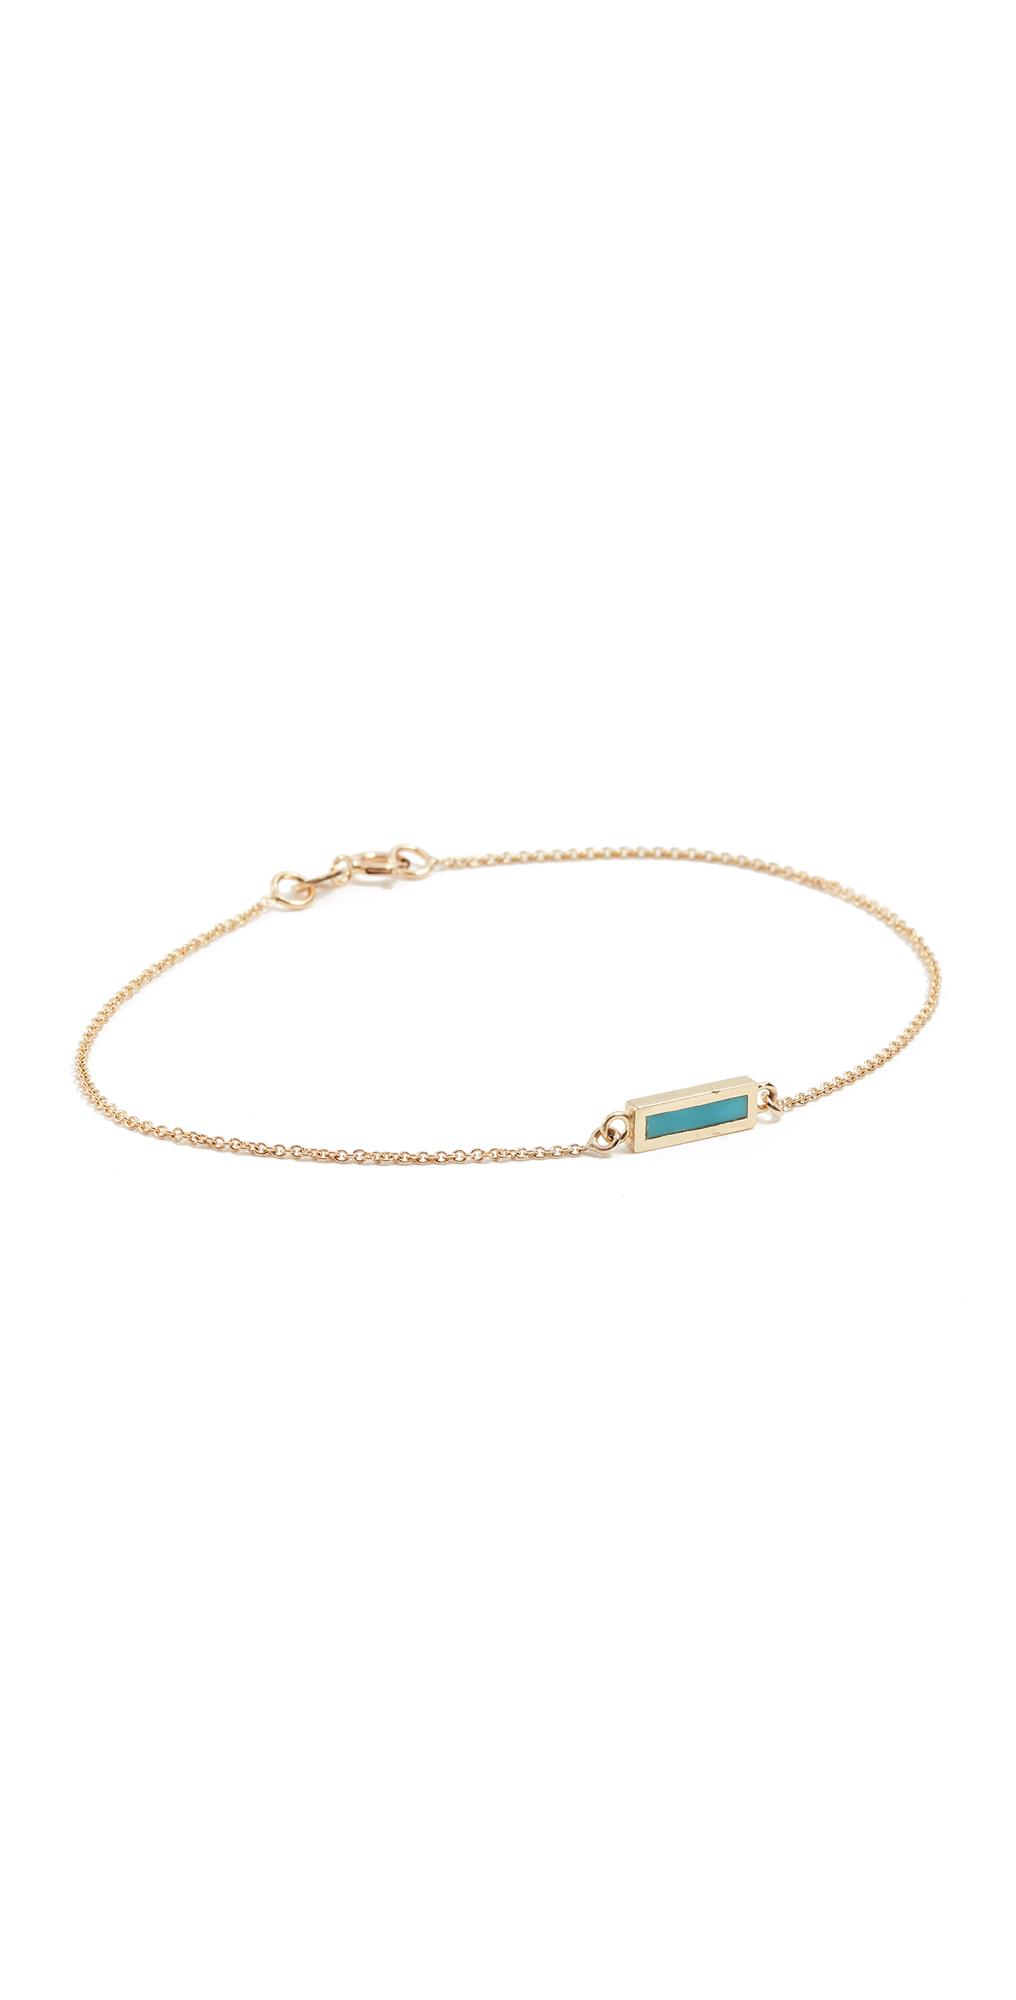 18k Gold Inlay Short Bar Bracelet